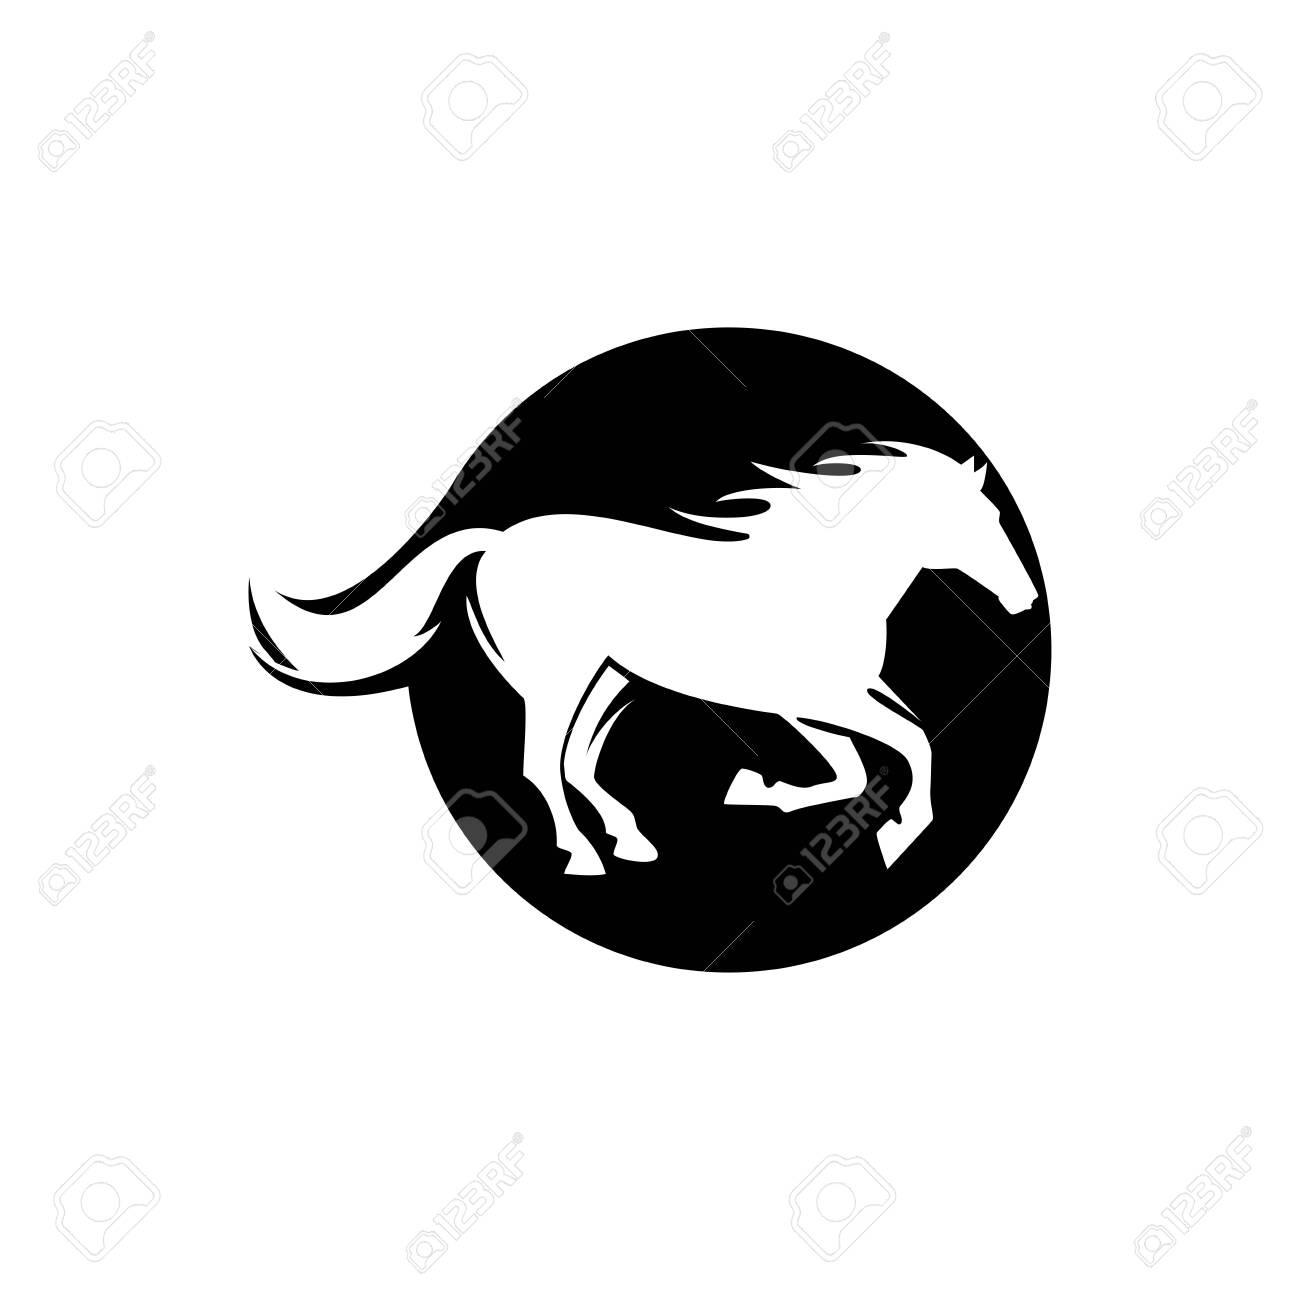 Silhouette Horses - ClipArt Best   Horse clip art, Horse silhouette, Horse  clipping